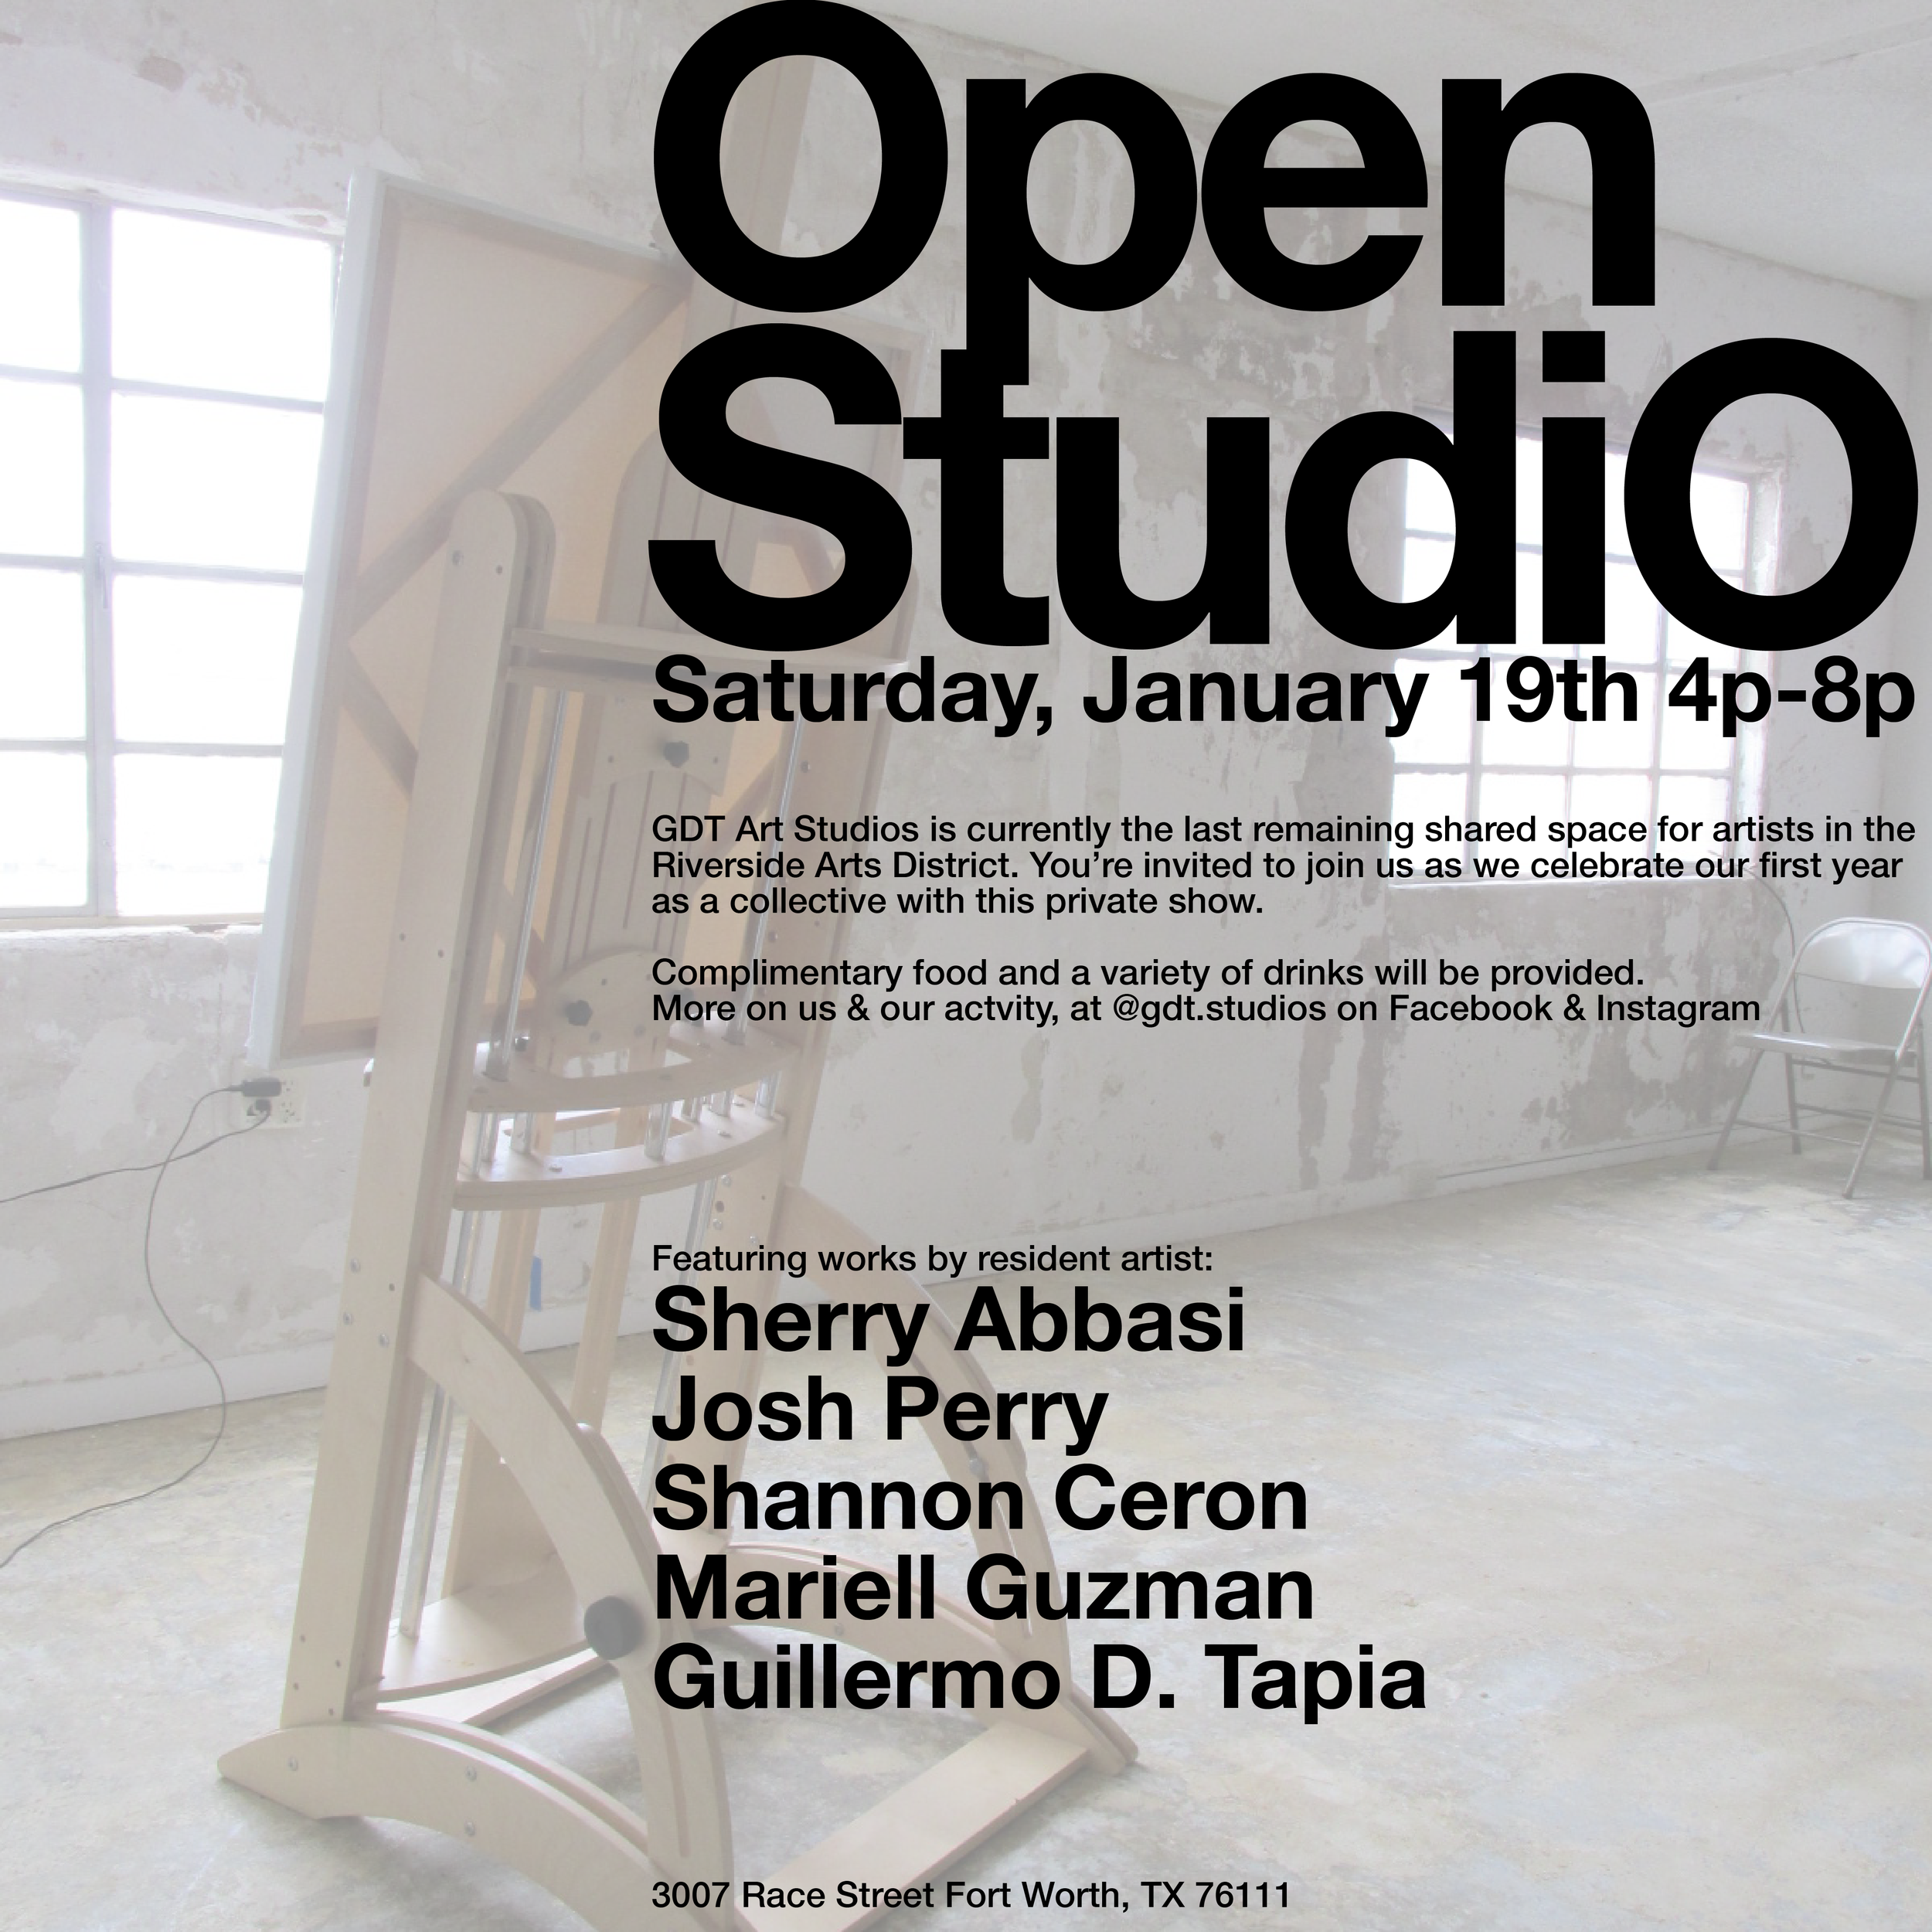 open studios invite-01.png